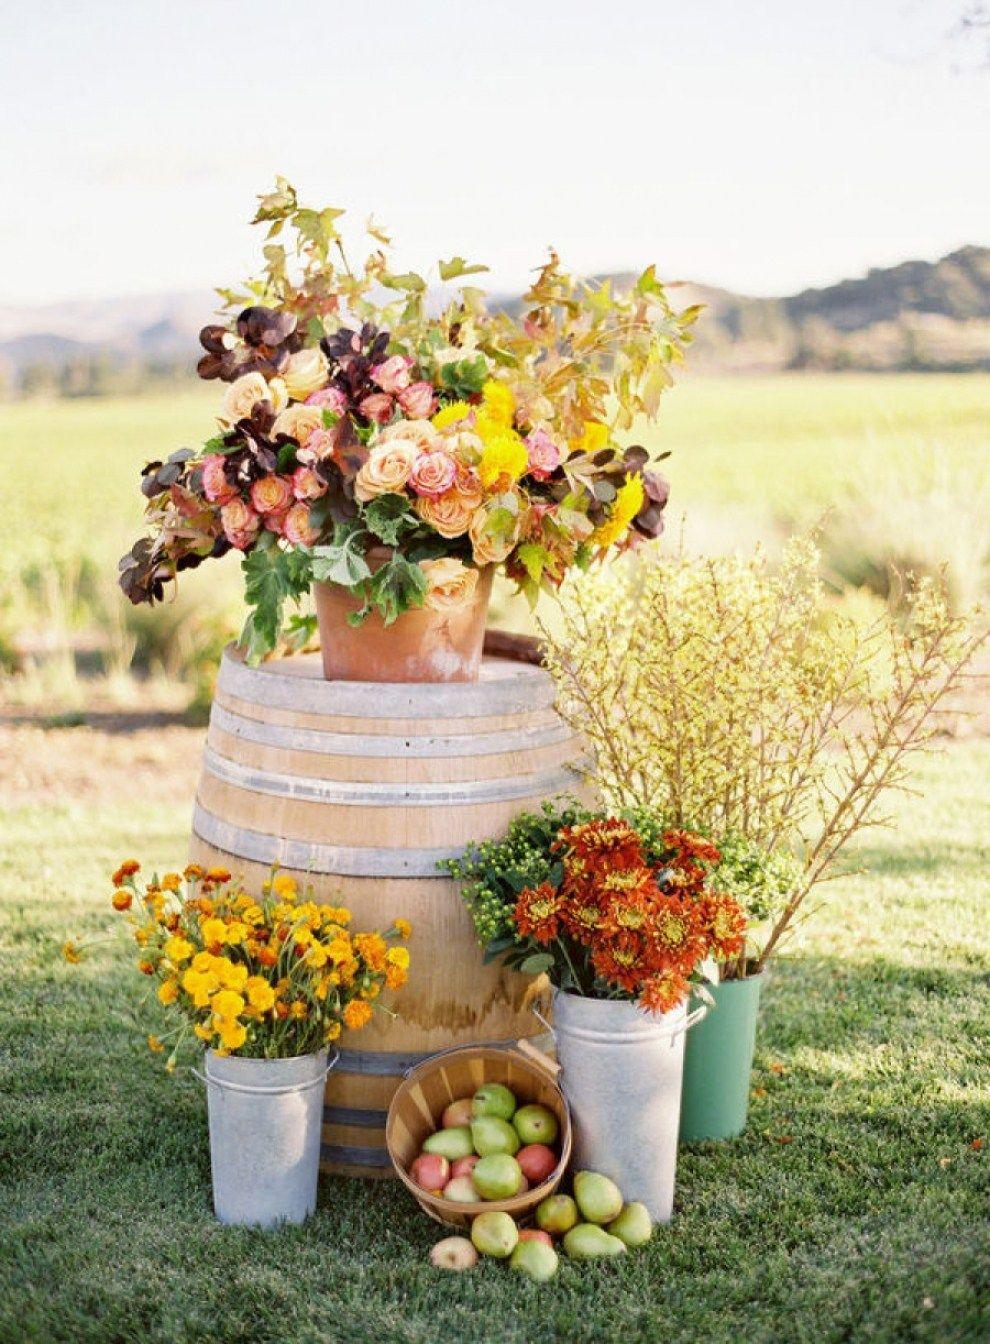 Awesome Italian Wedding Themes Fall Winery Italian Wedding Themes